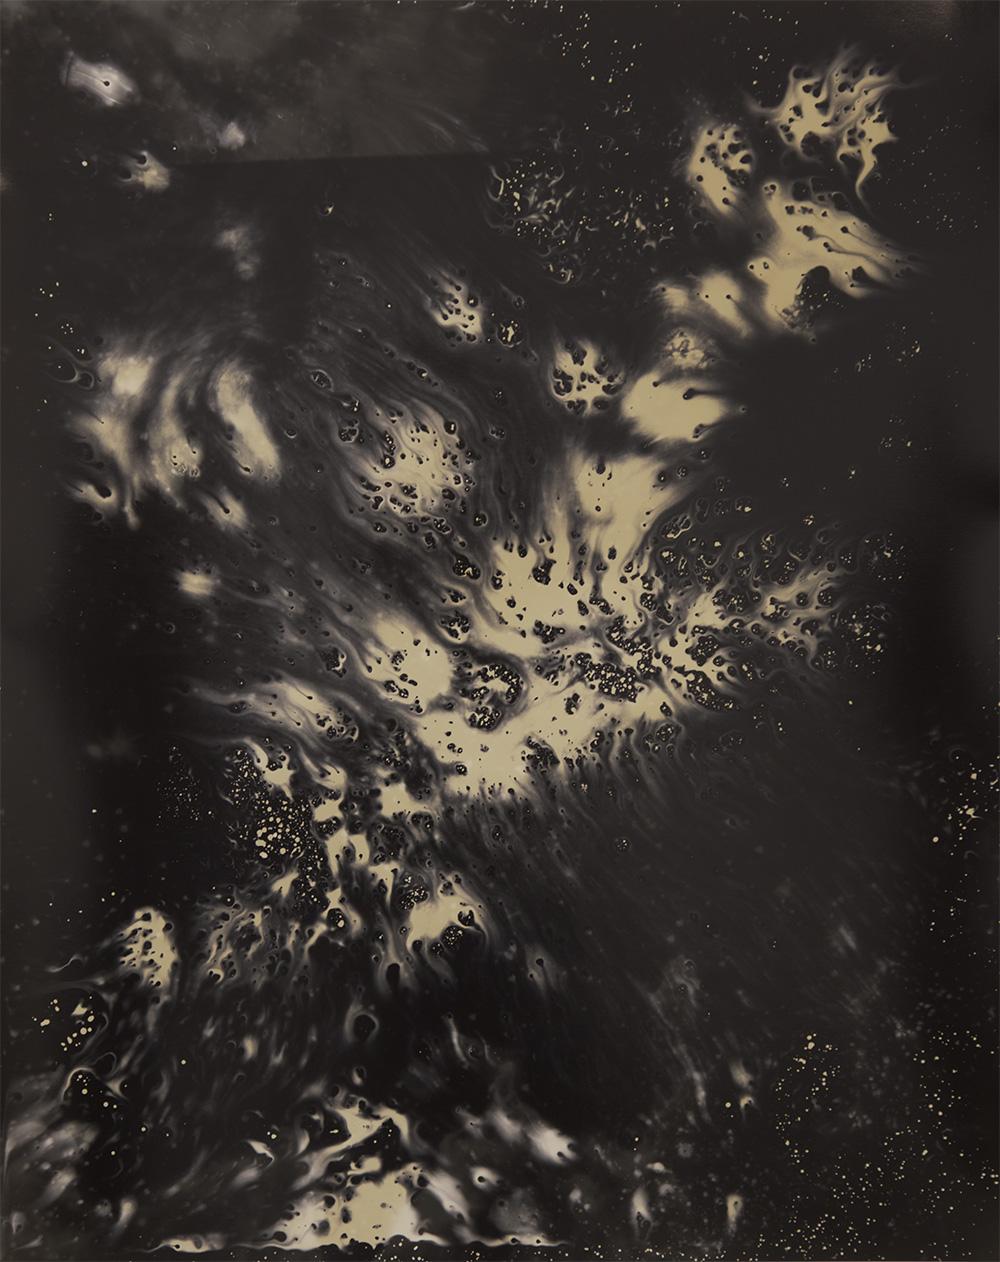 "Lava flow , Gelatin silver print, 20x16"", 2016"